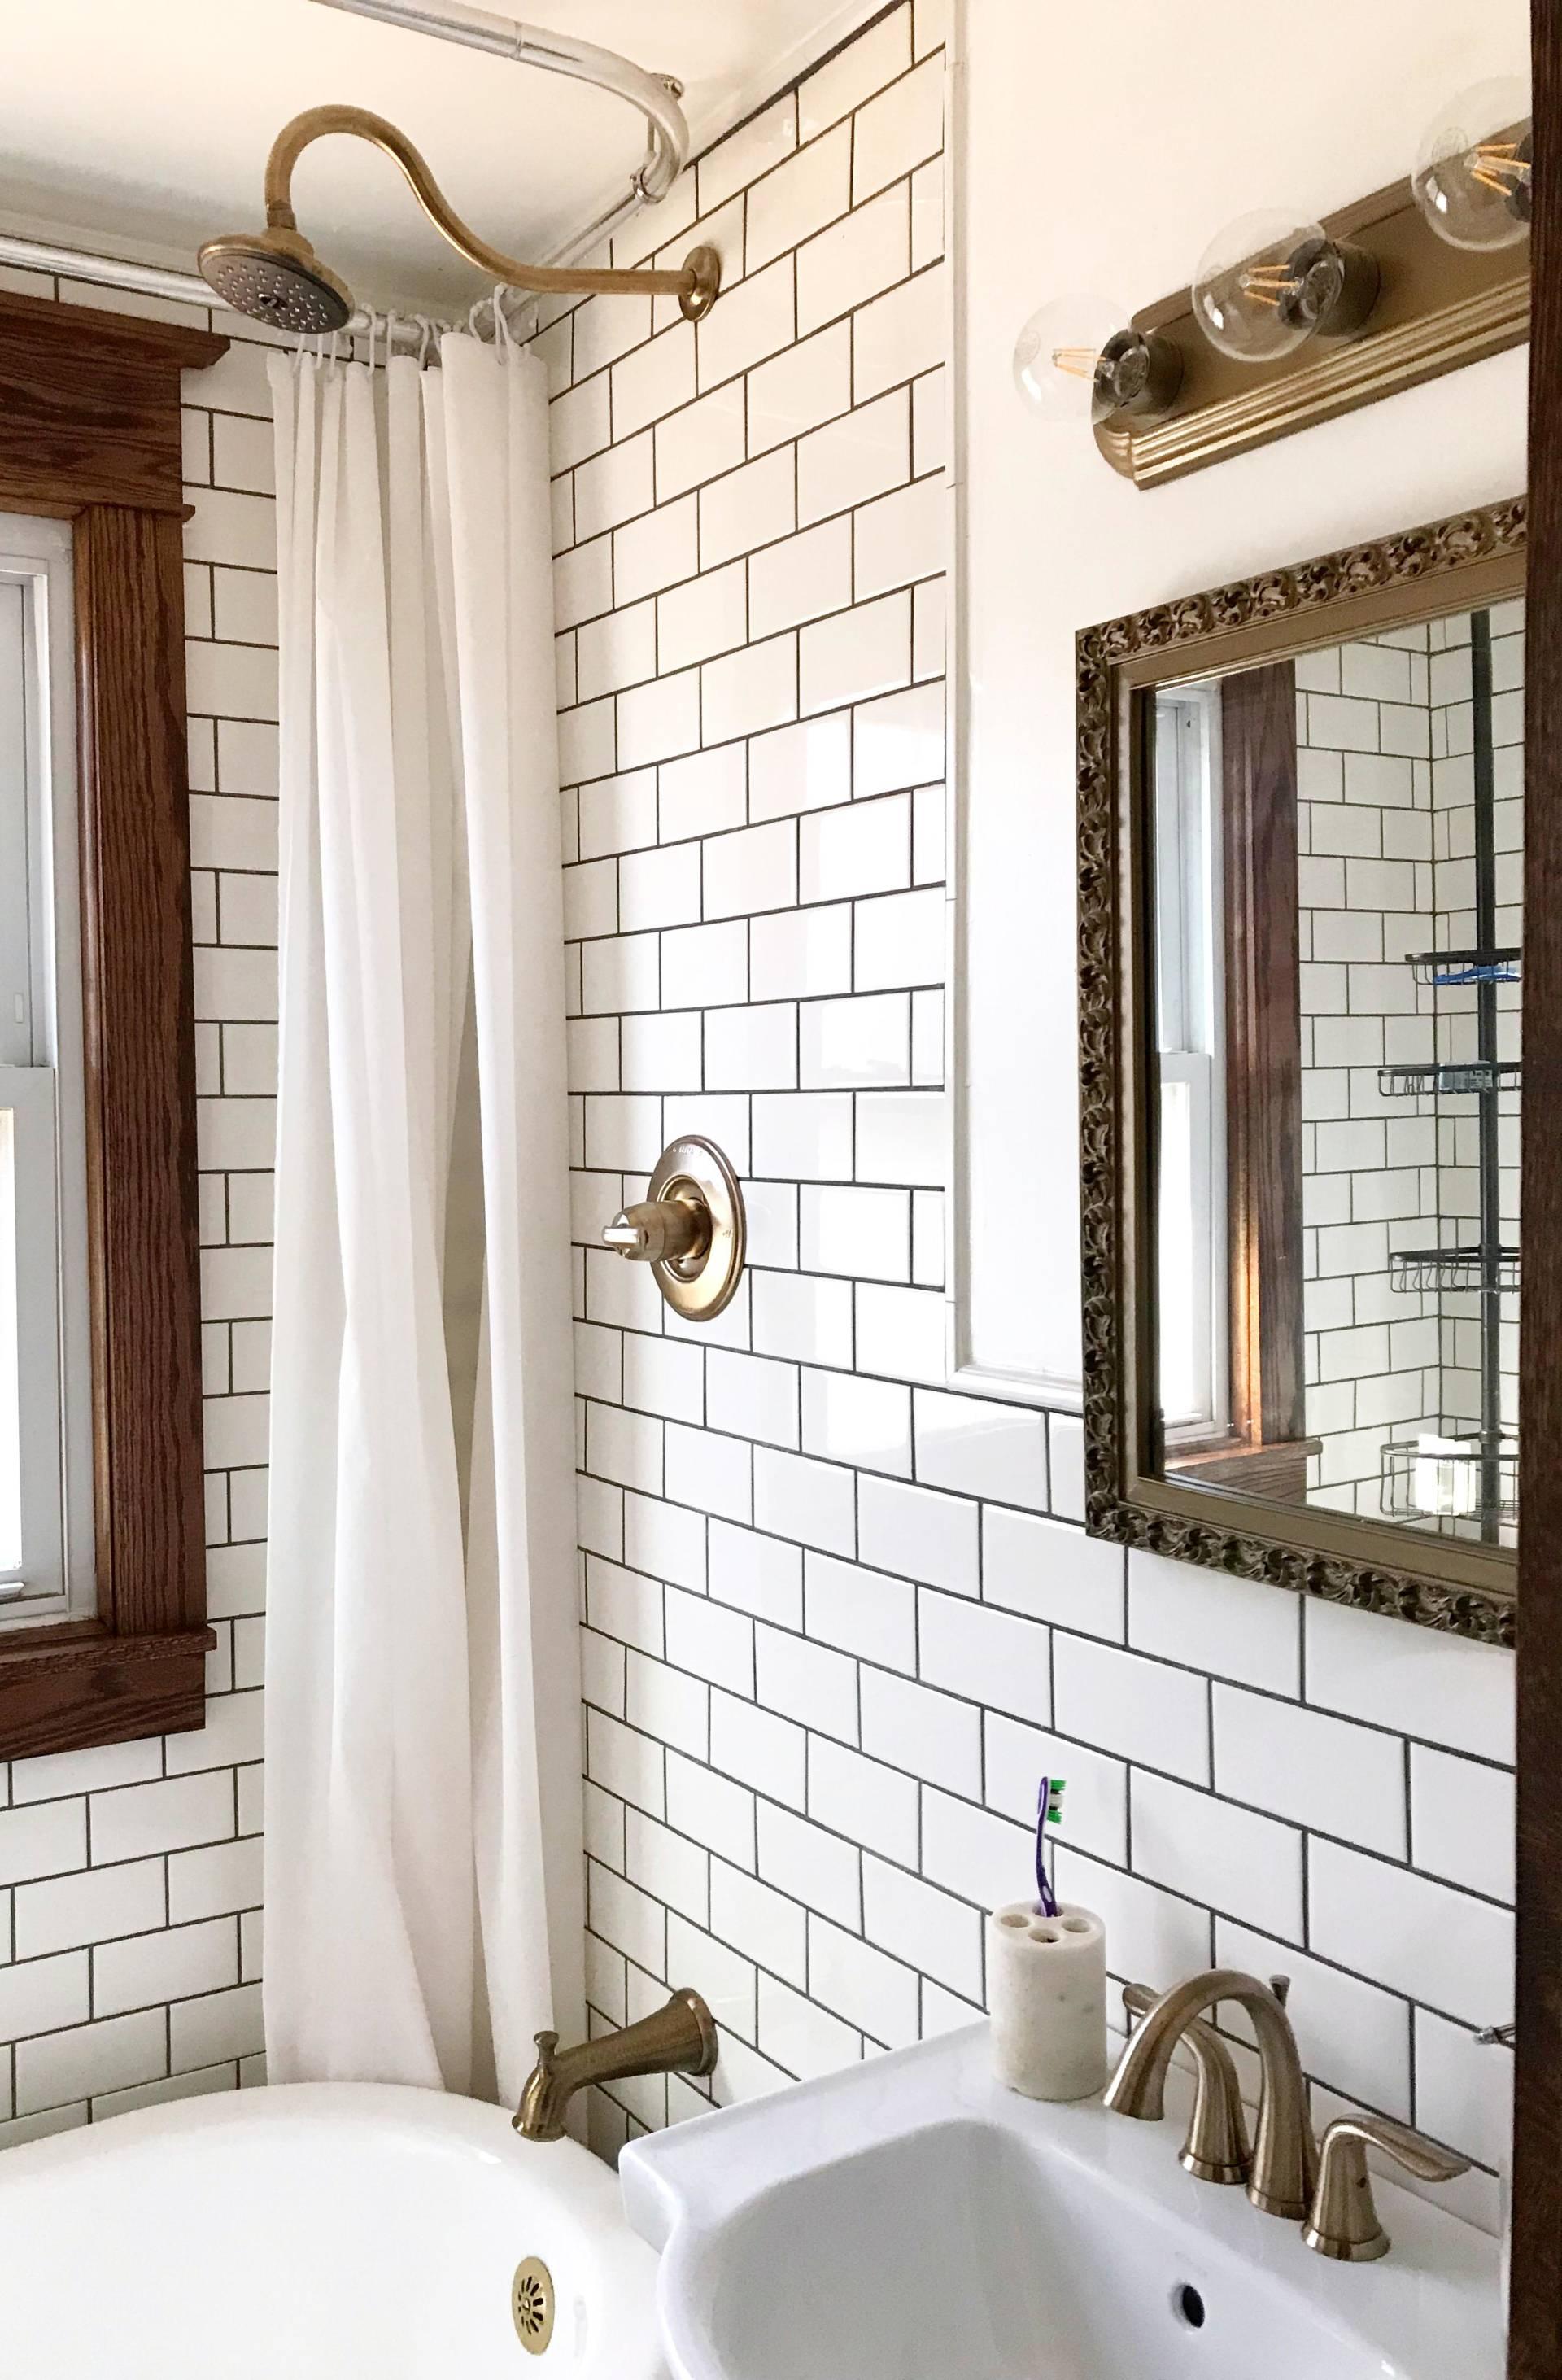 1920s lakehouse tiny bathroom gets a full renovation